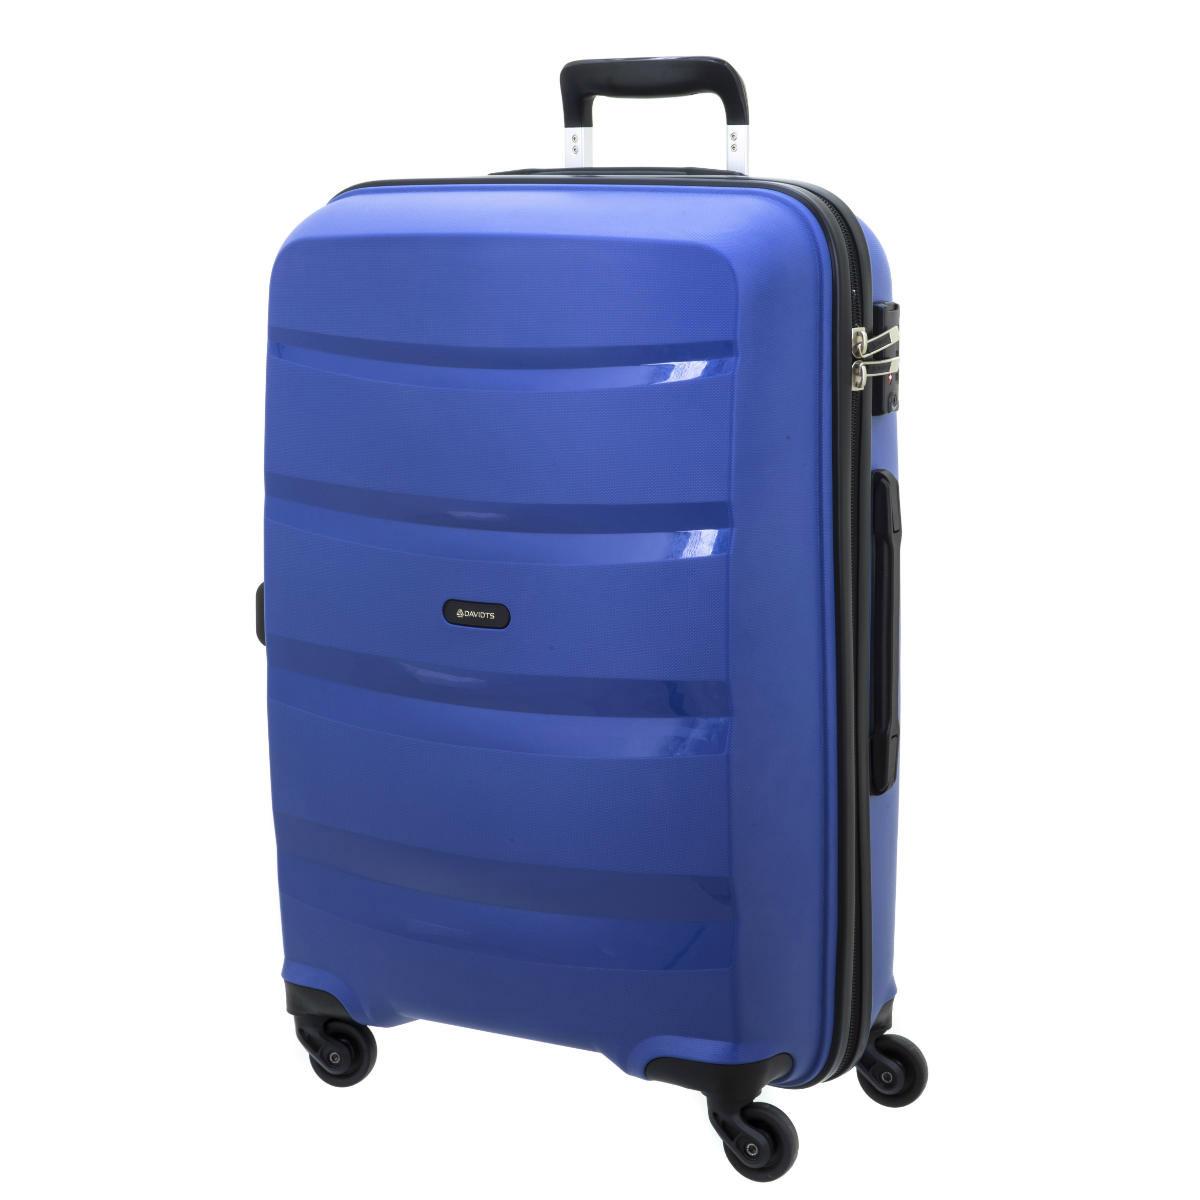 Valise trolley coque polypropylène \'Davidt\'s\' bleu - 66x45x26 cm - [Q3496]